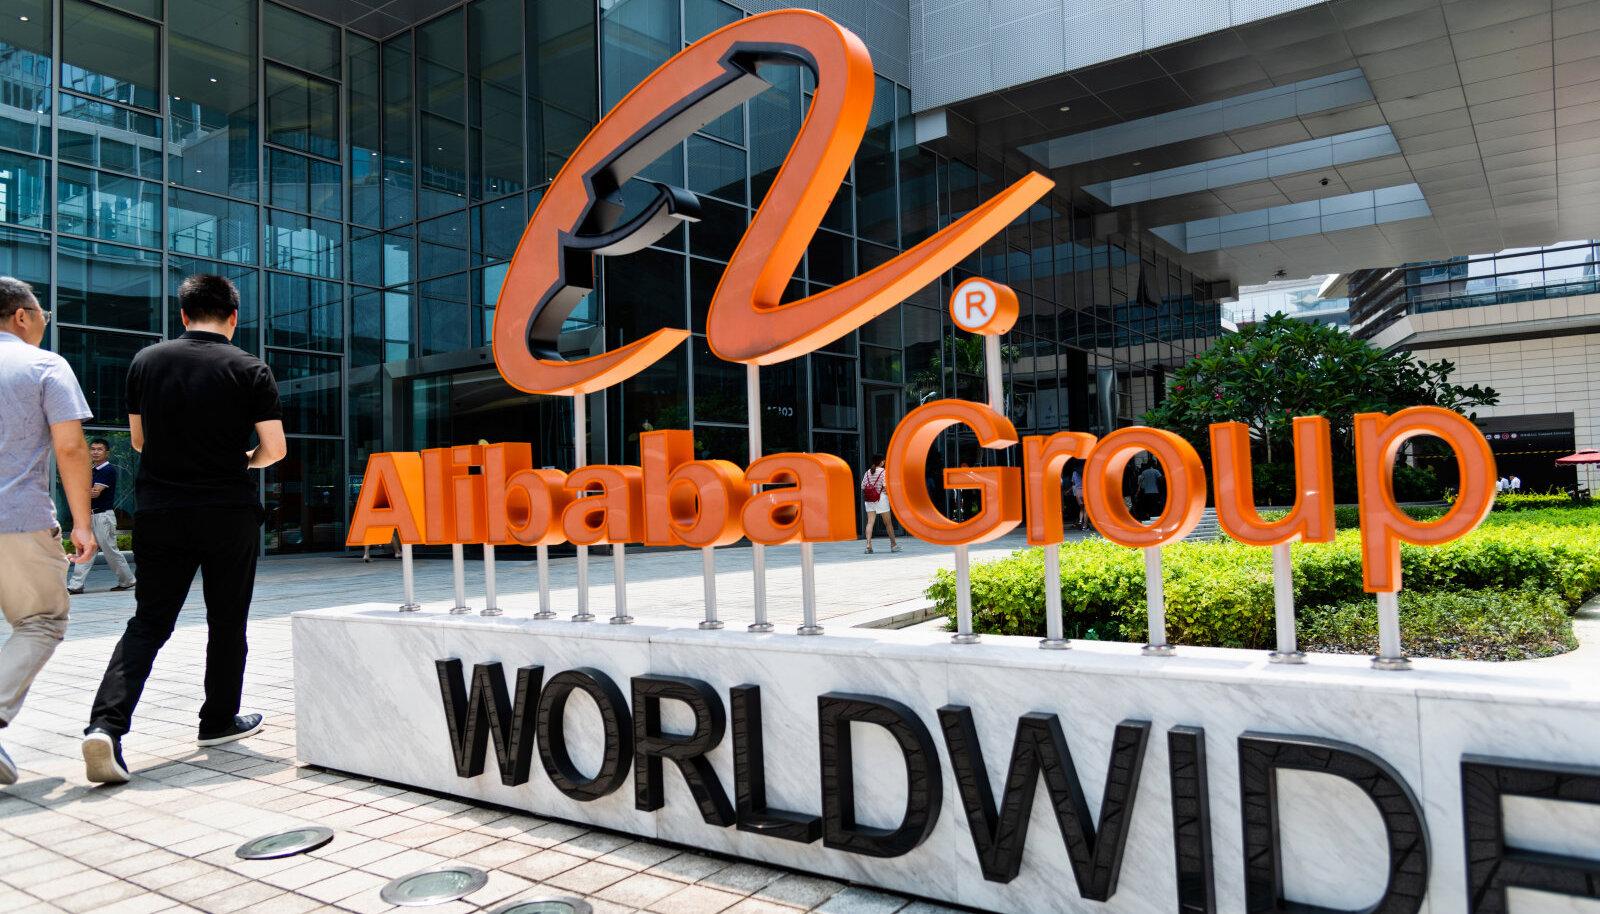 Alibaba peakontor